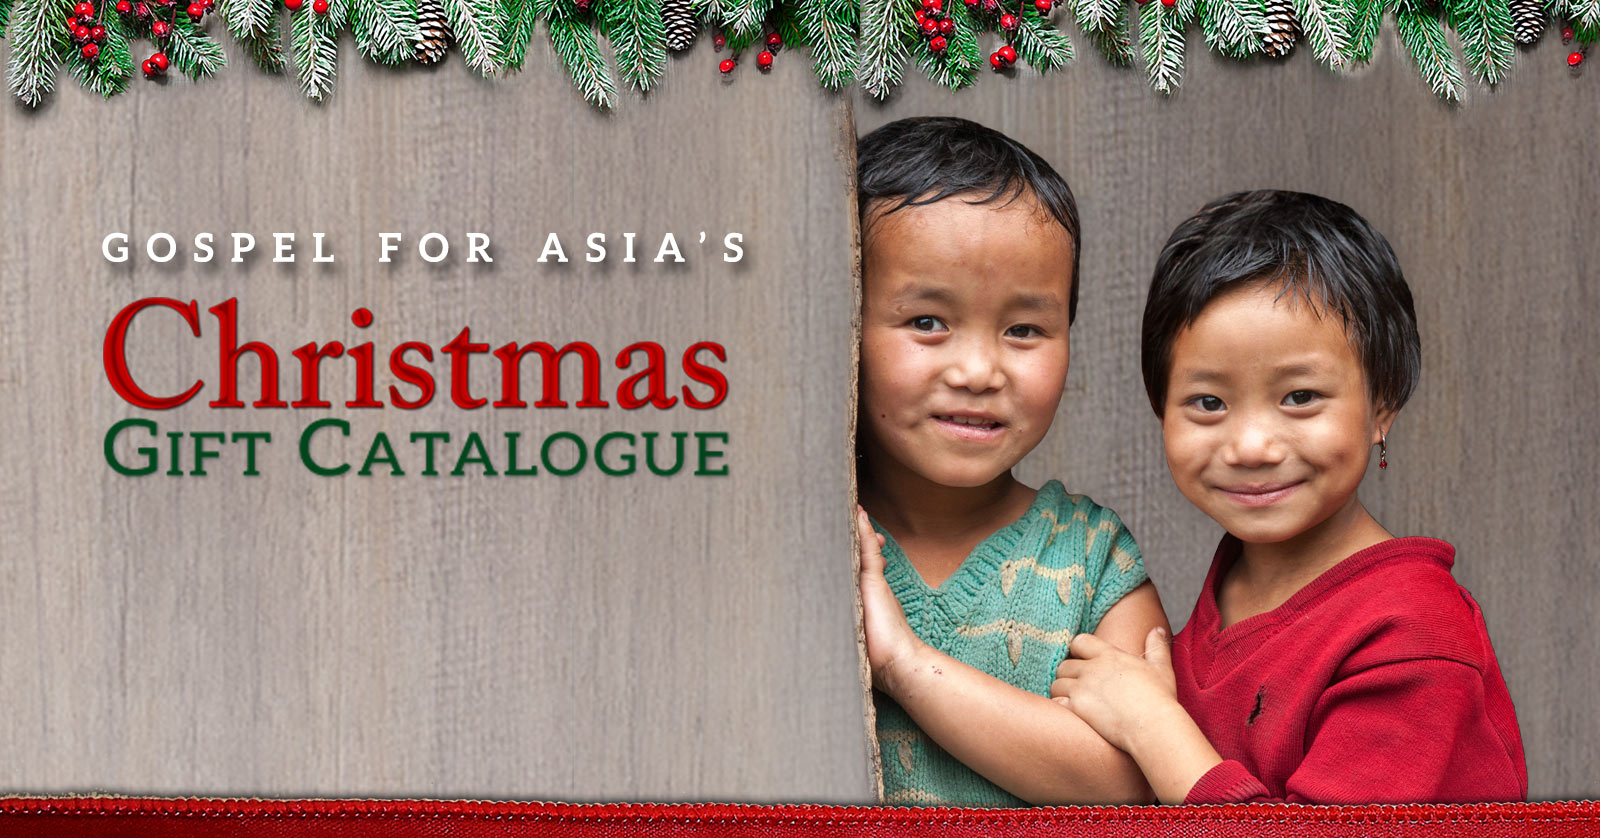 Gift Catalogue Order Form - GFA\'s Christmas Gift Catalogue